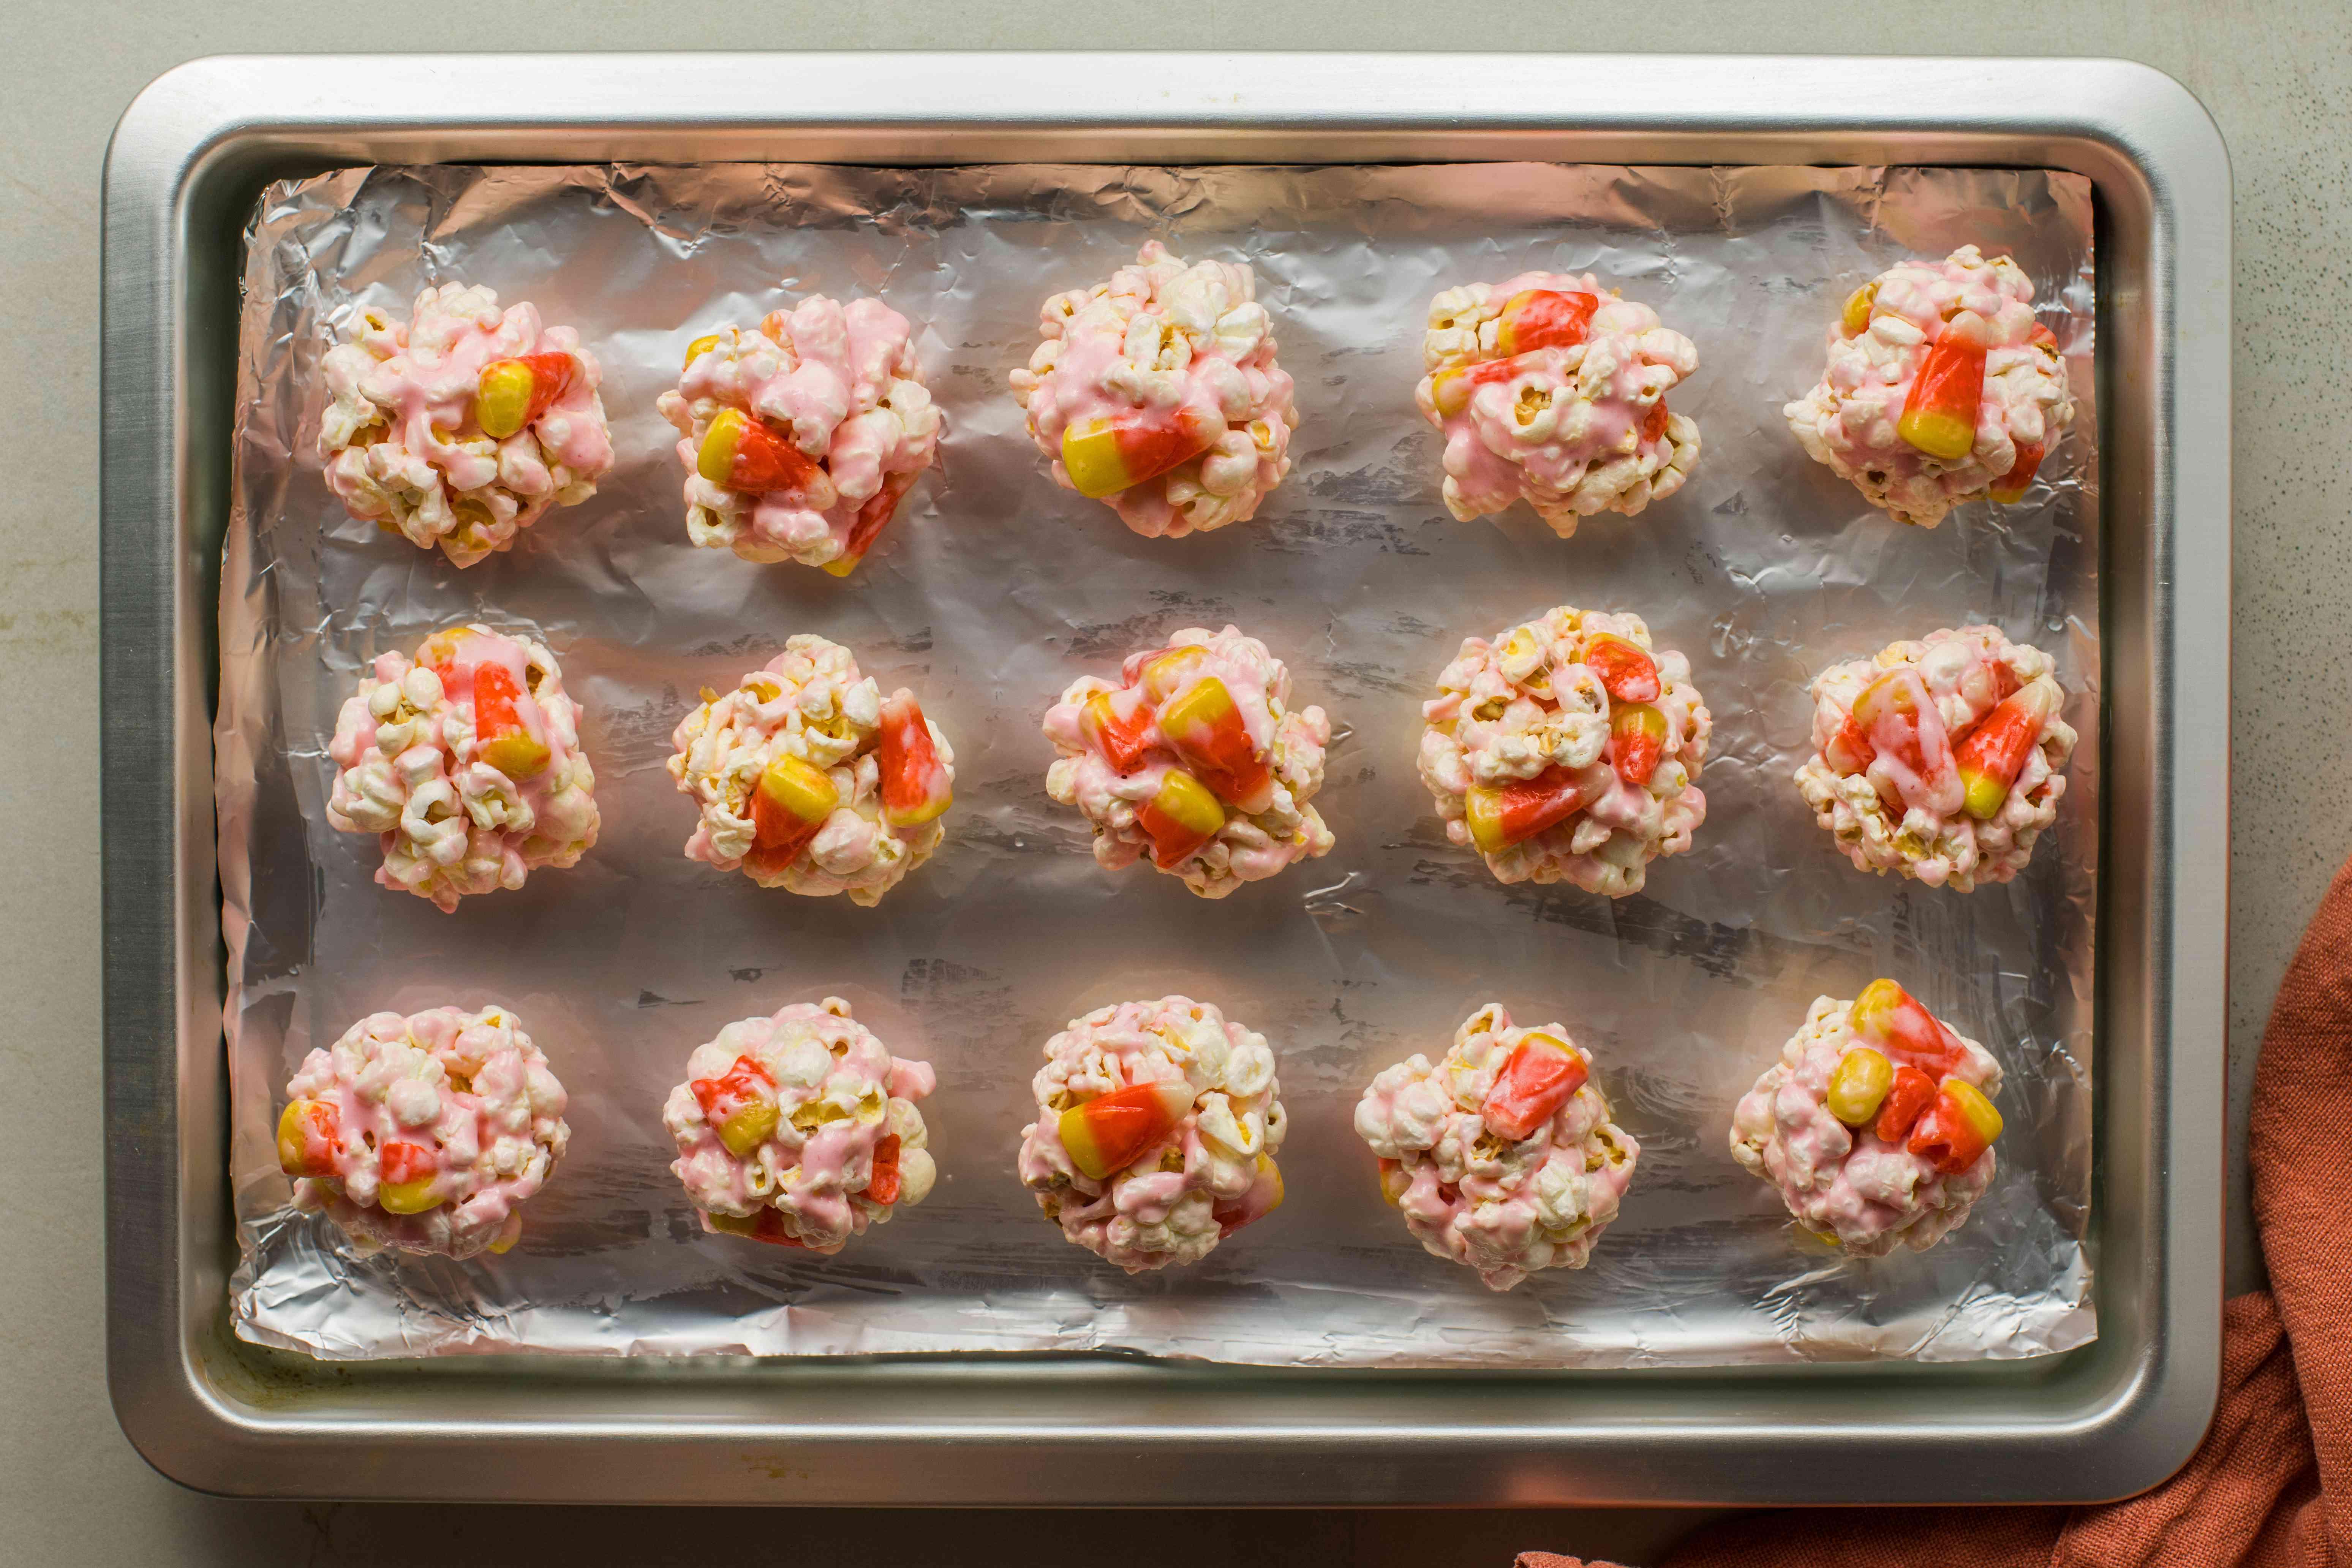 Place popcorn balls on tray